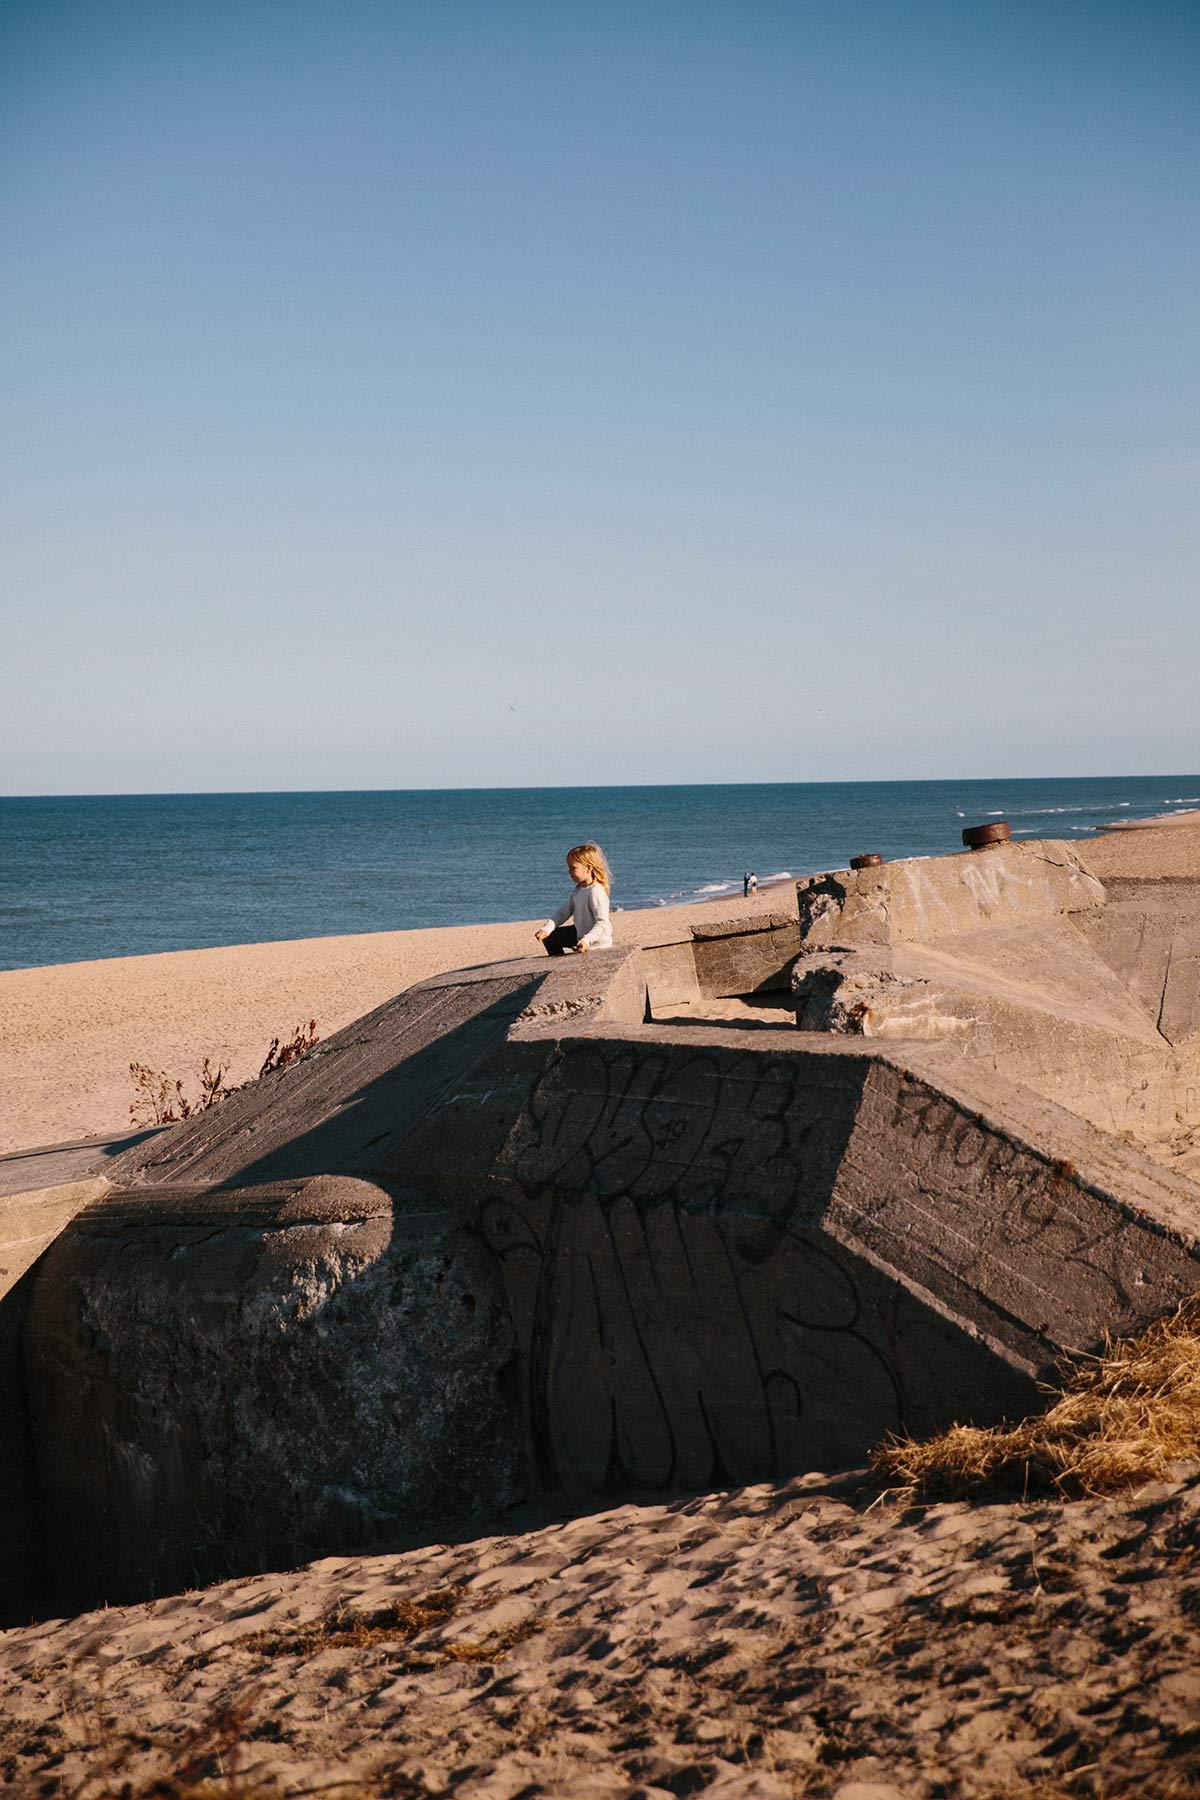 bunker sondervig änische nordseeküste